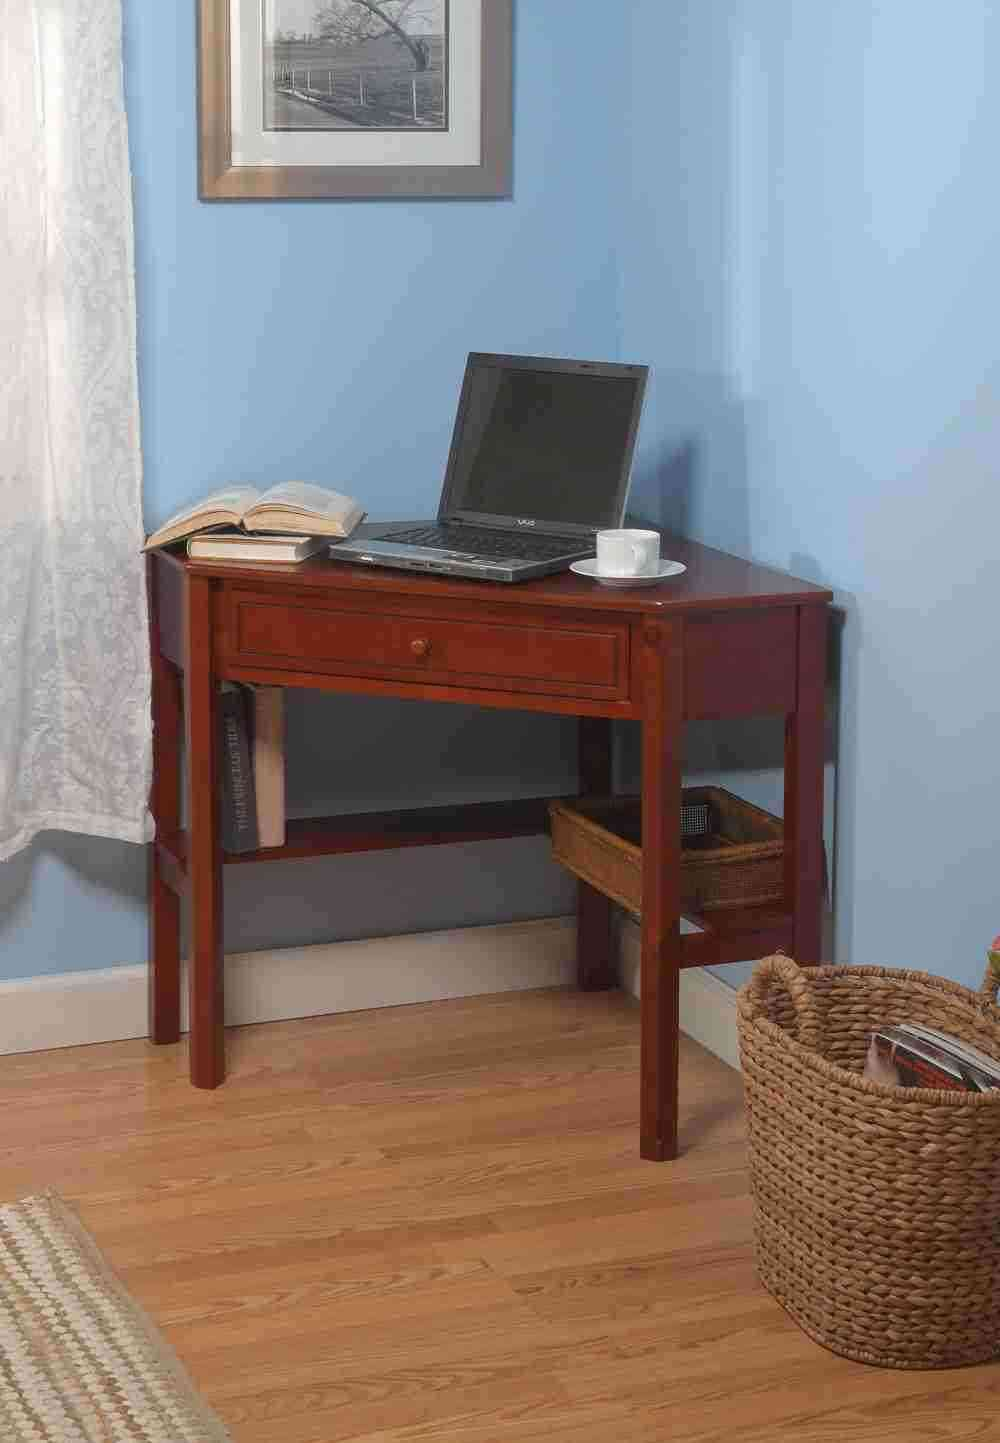 Small corner writing desk decor ideasdecor ideas - Writing corner ideas ...